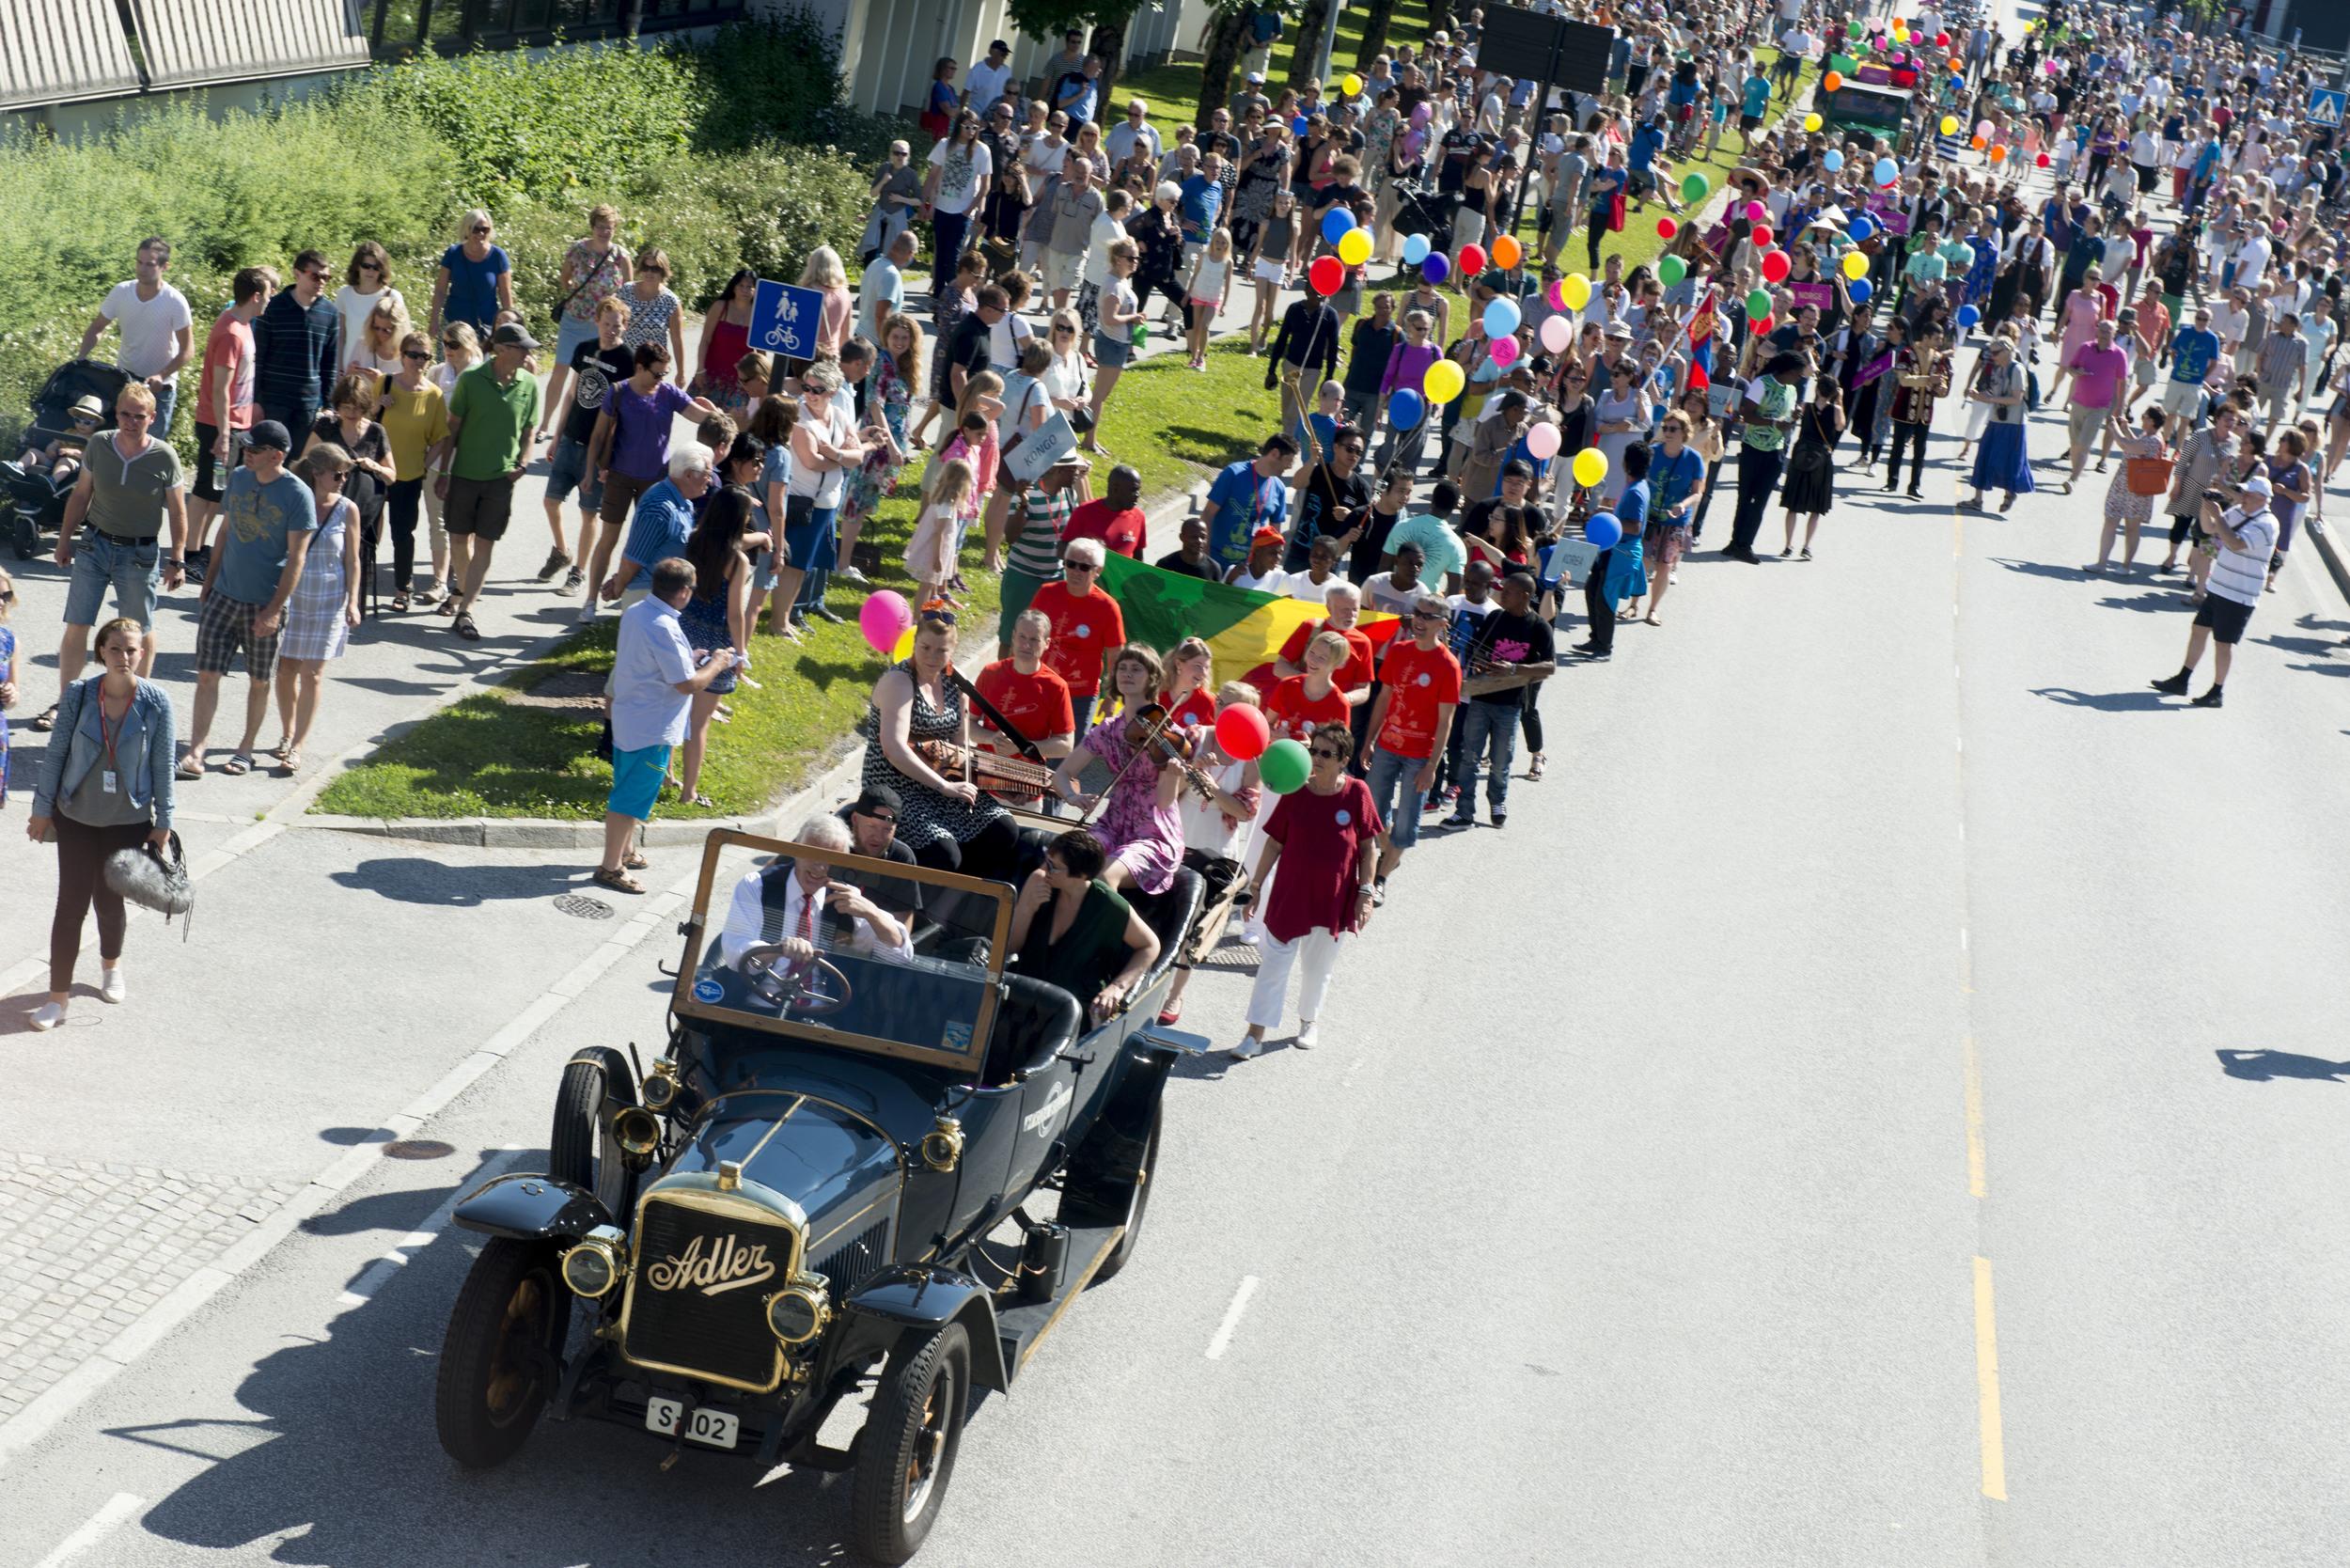 Parade_Arve Ullebø_ARU7640.jpg